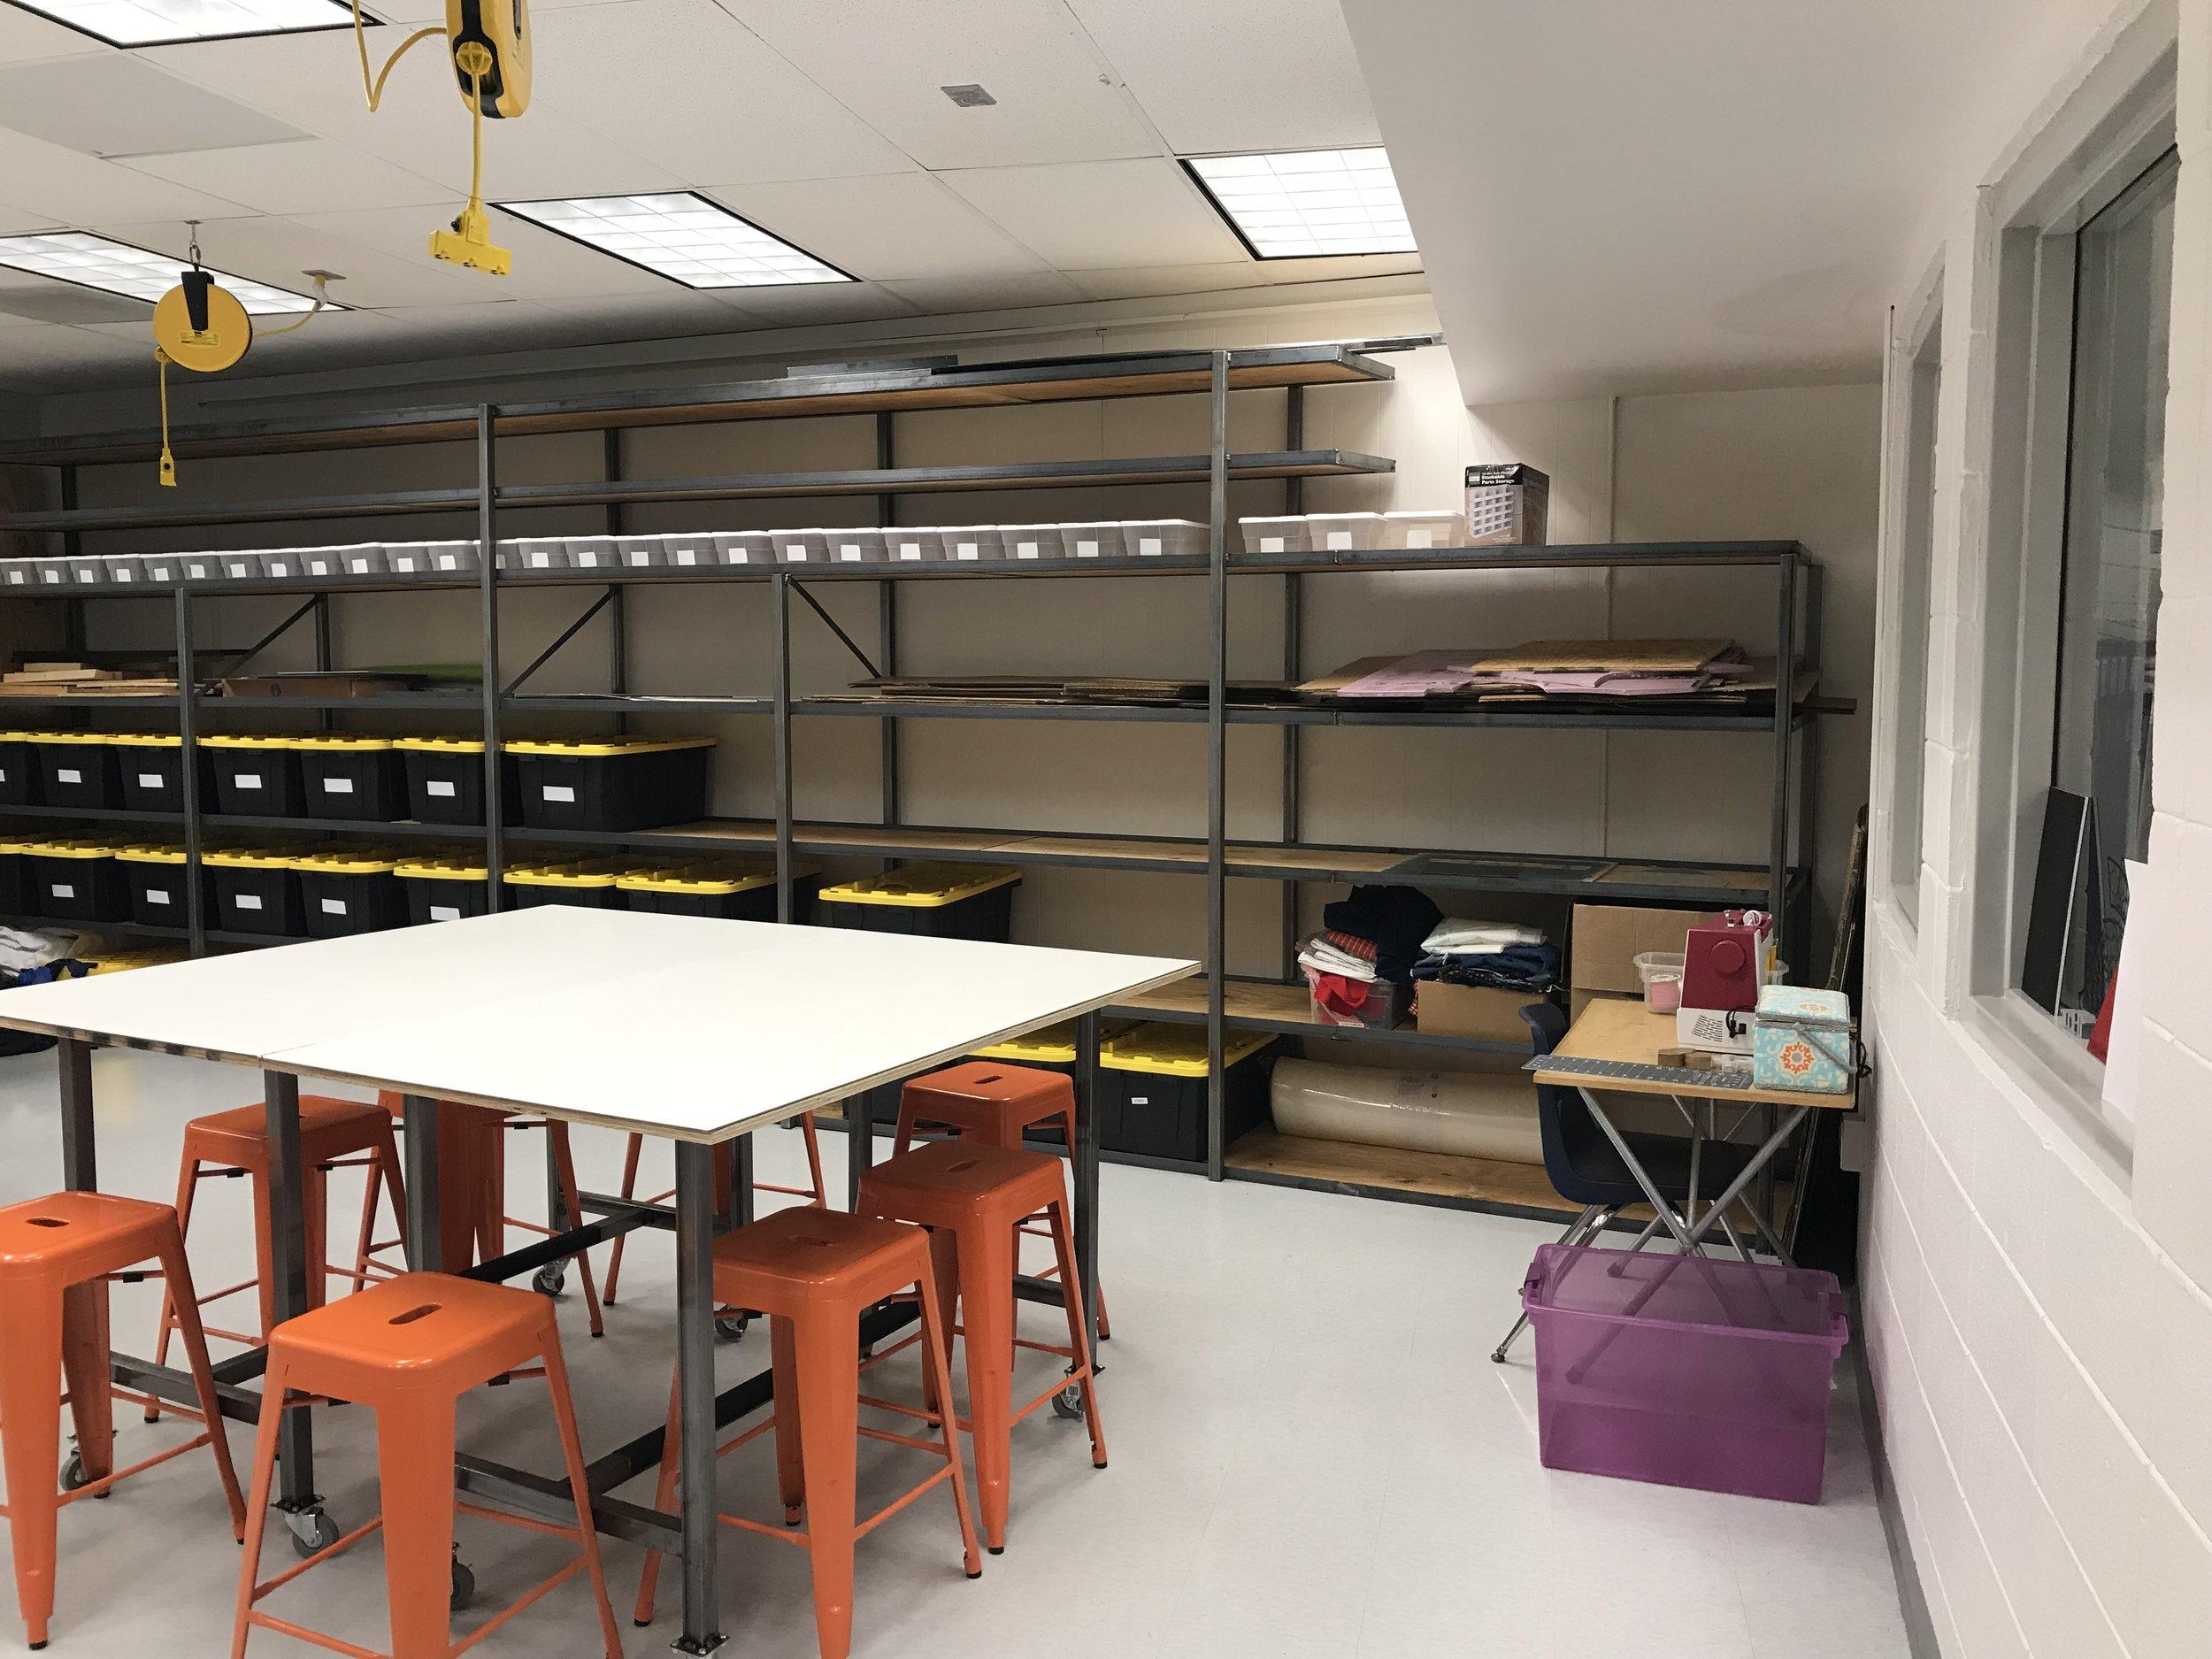 Storage unit and custom table